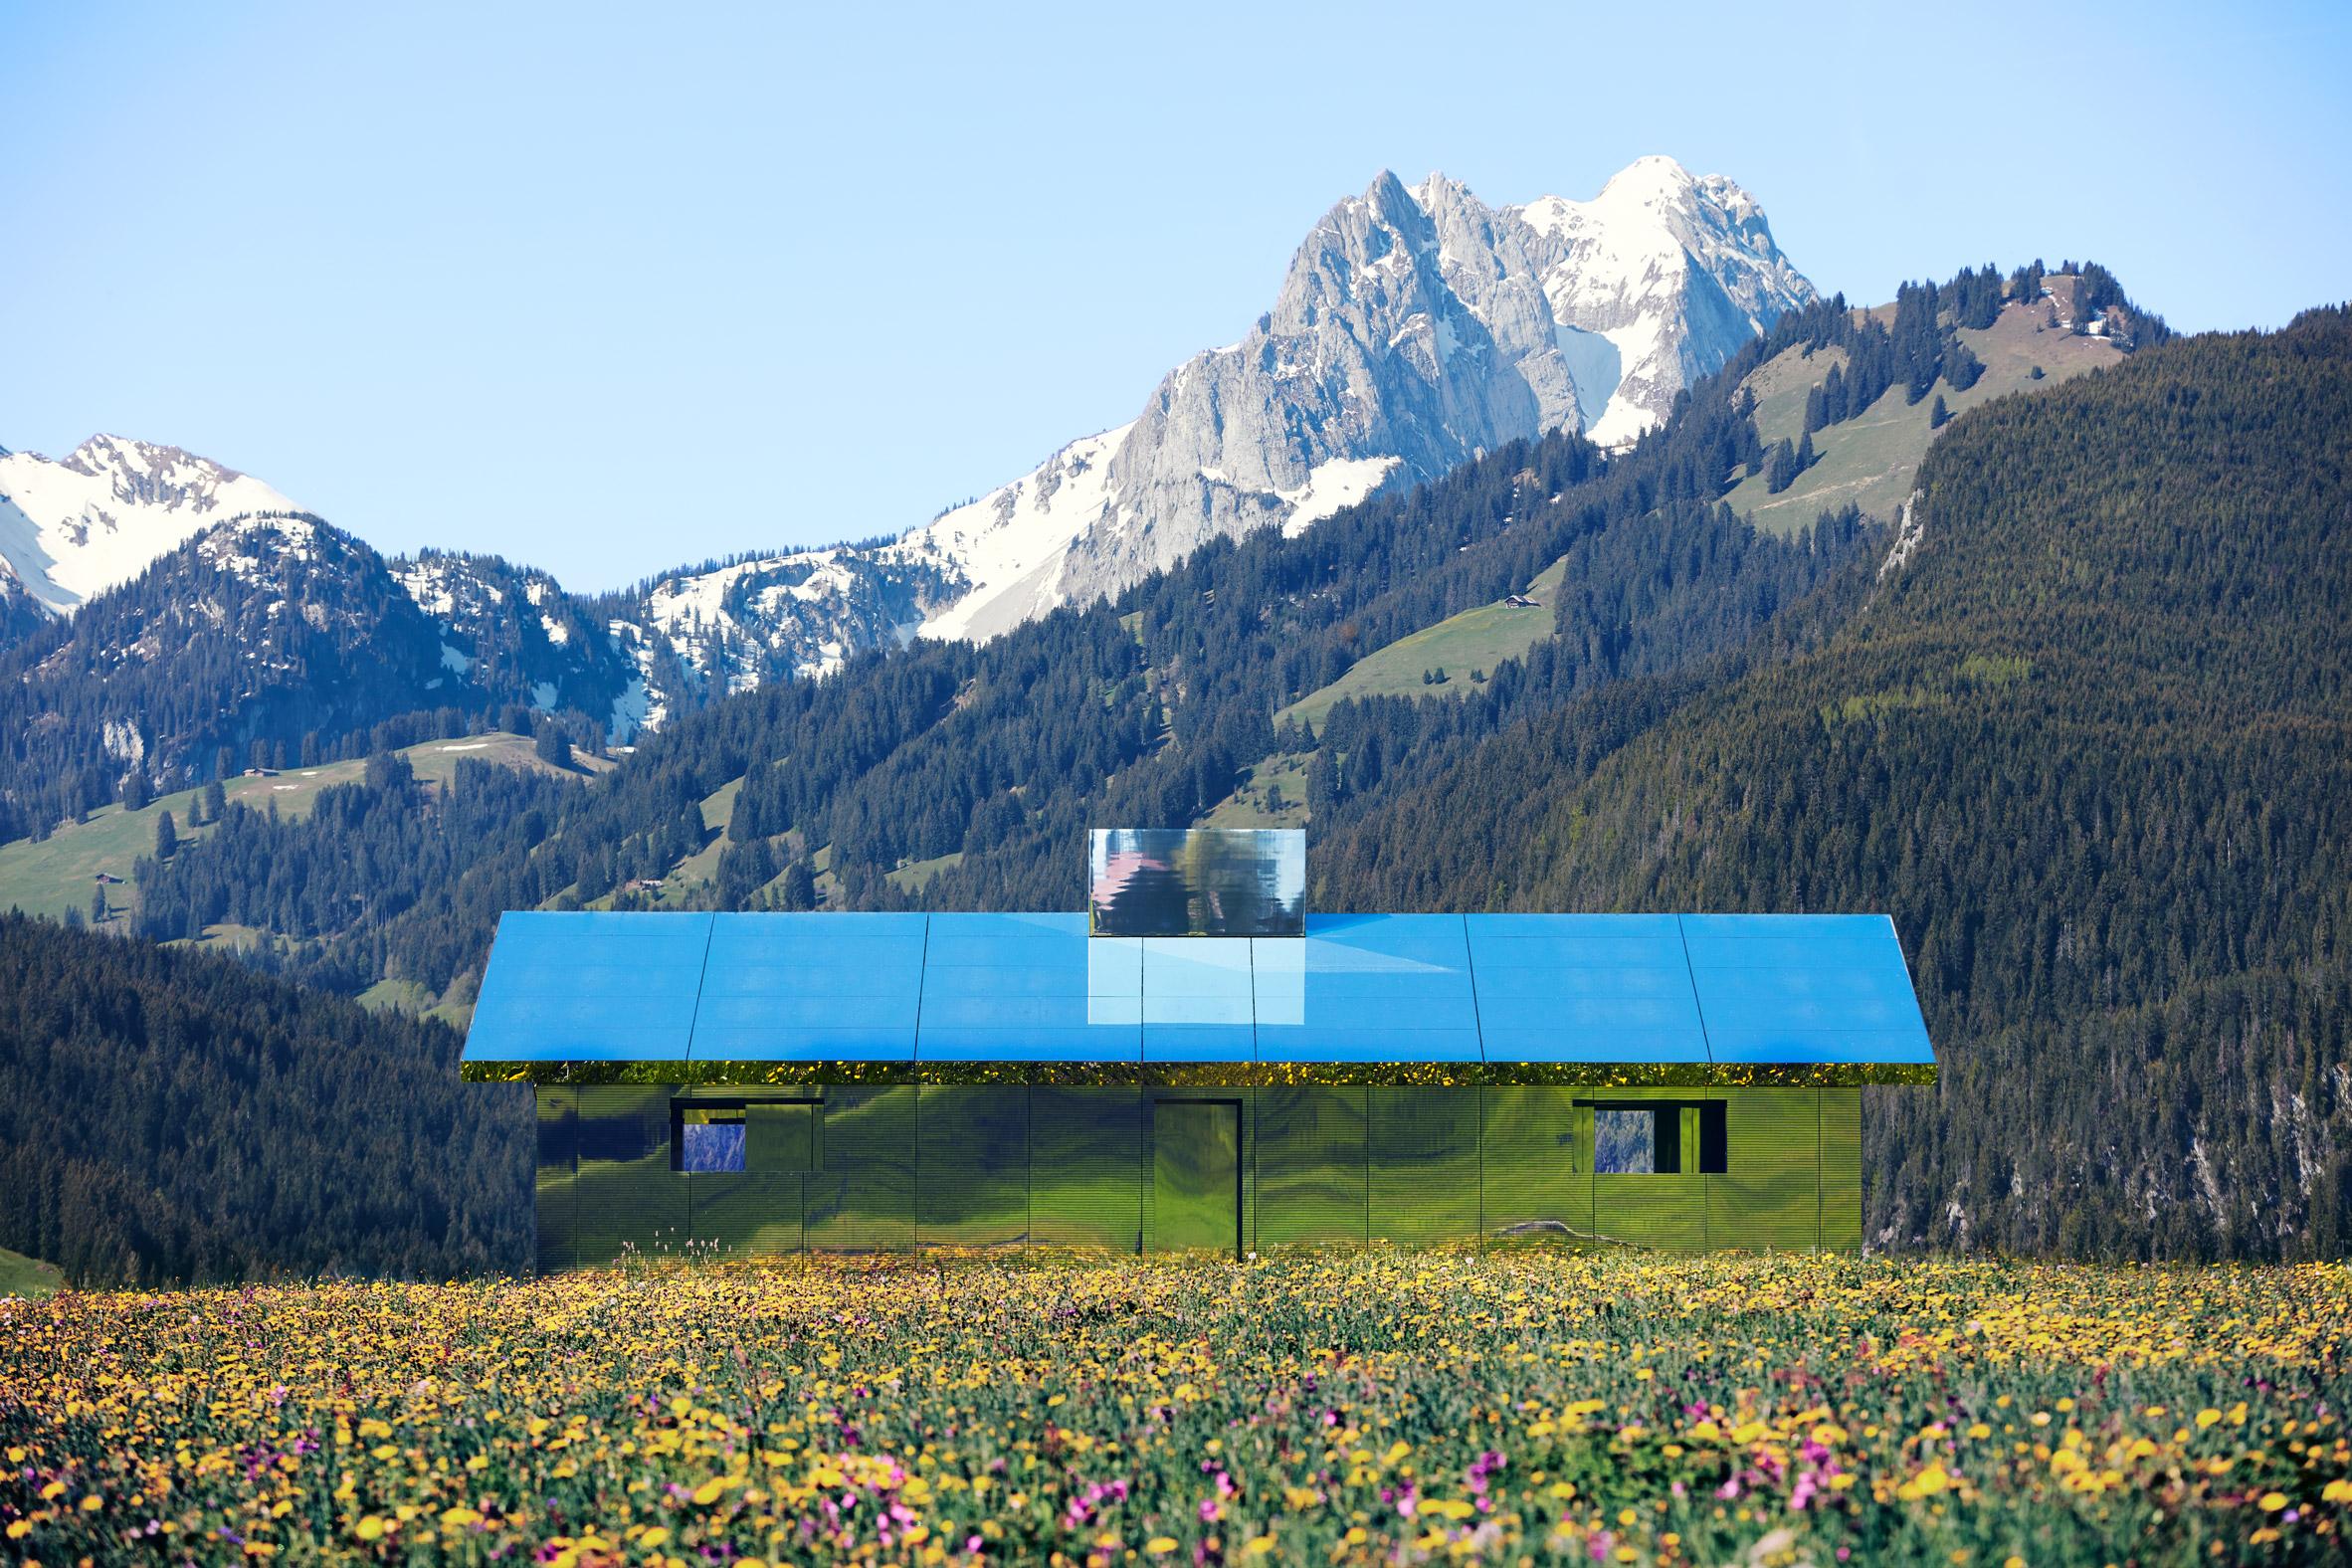 Mirage Gstaad mirrored building art installation by Doug Aitken in Switzerland in spring